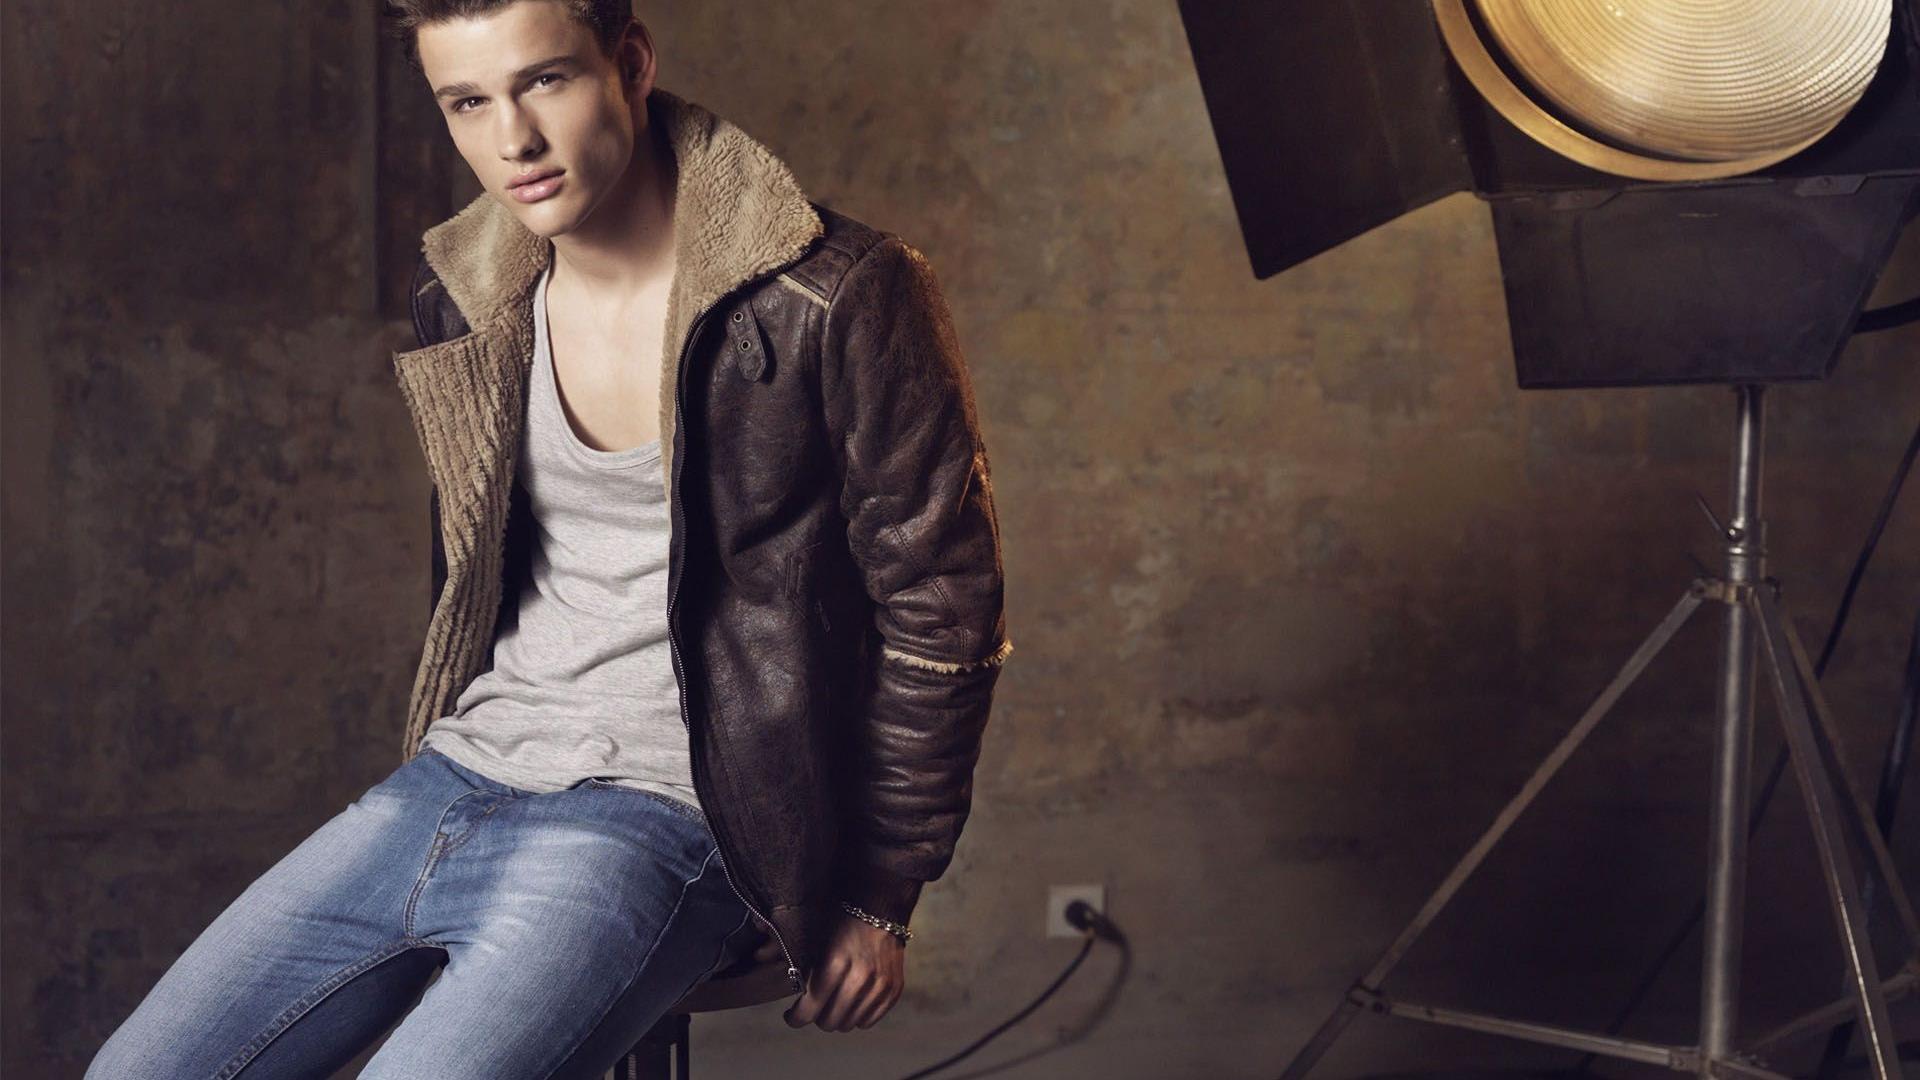 Man Fashion Wallpapers Top Free Man Fashion Backgrounds Wallpaperaccess